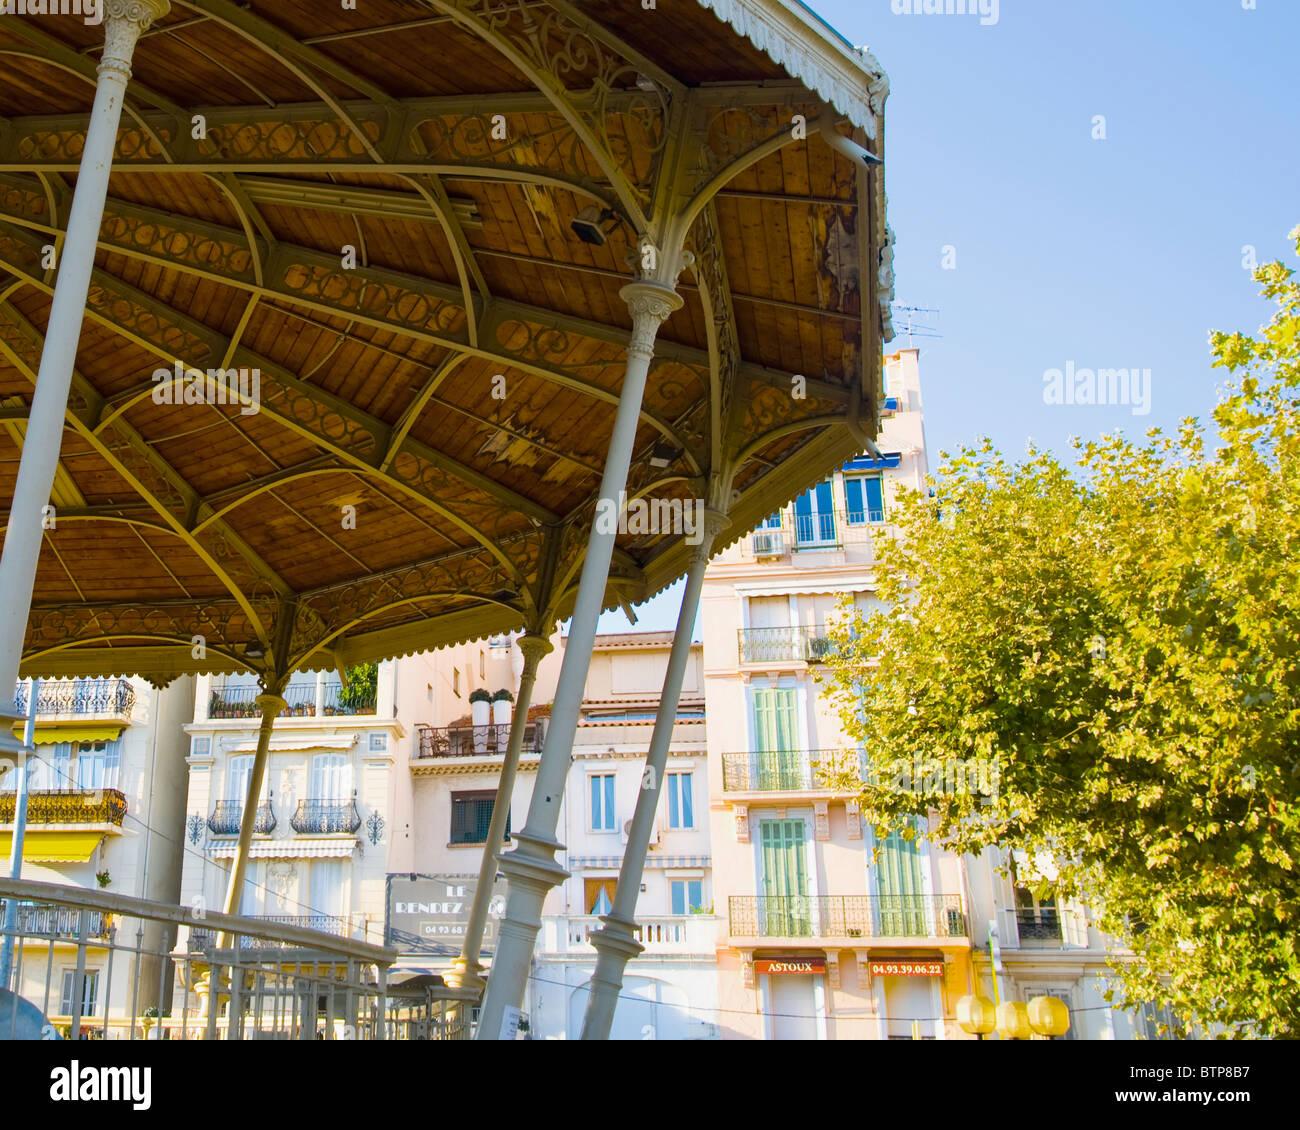 Bandstand, Cannes, Cote D'Azur, France - Stock Image